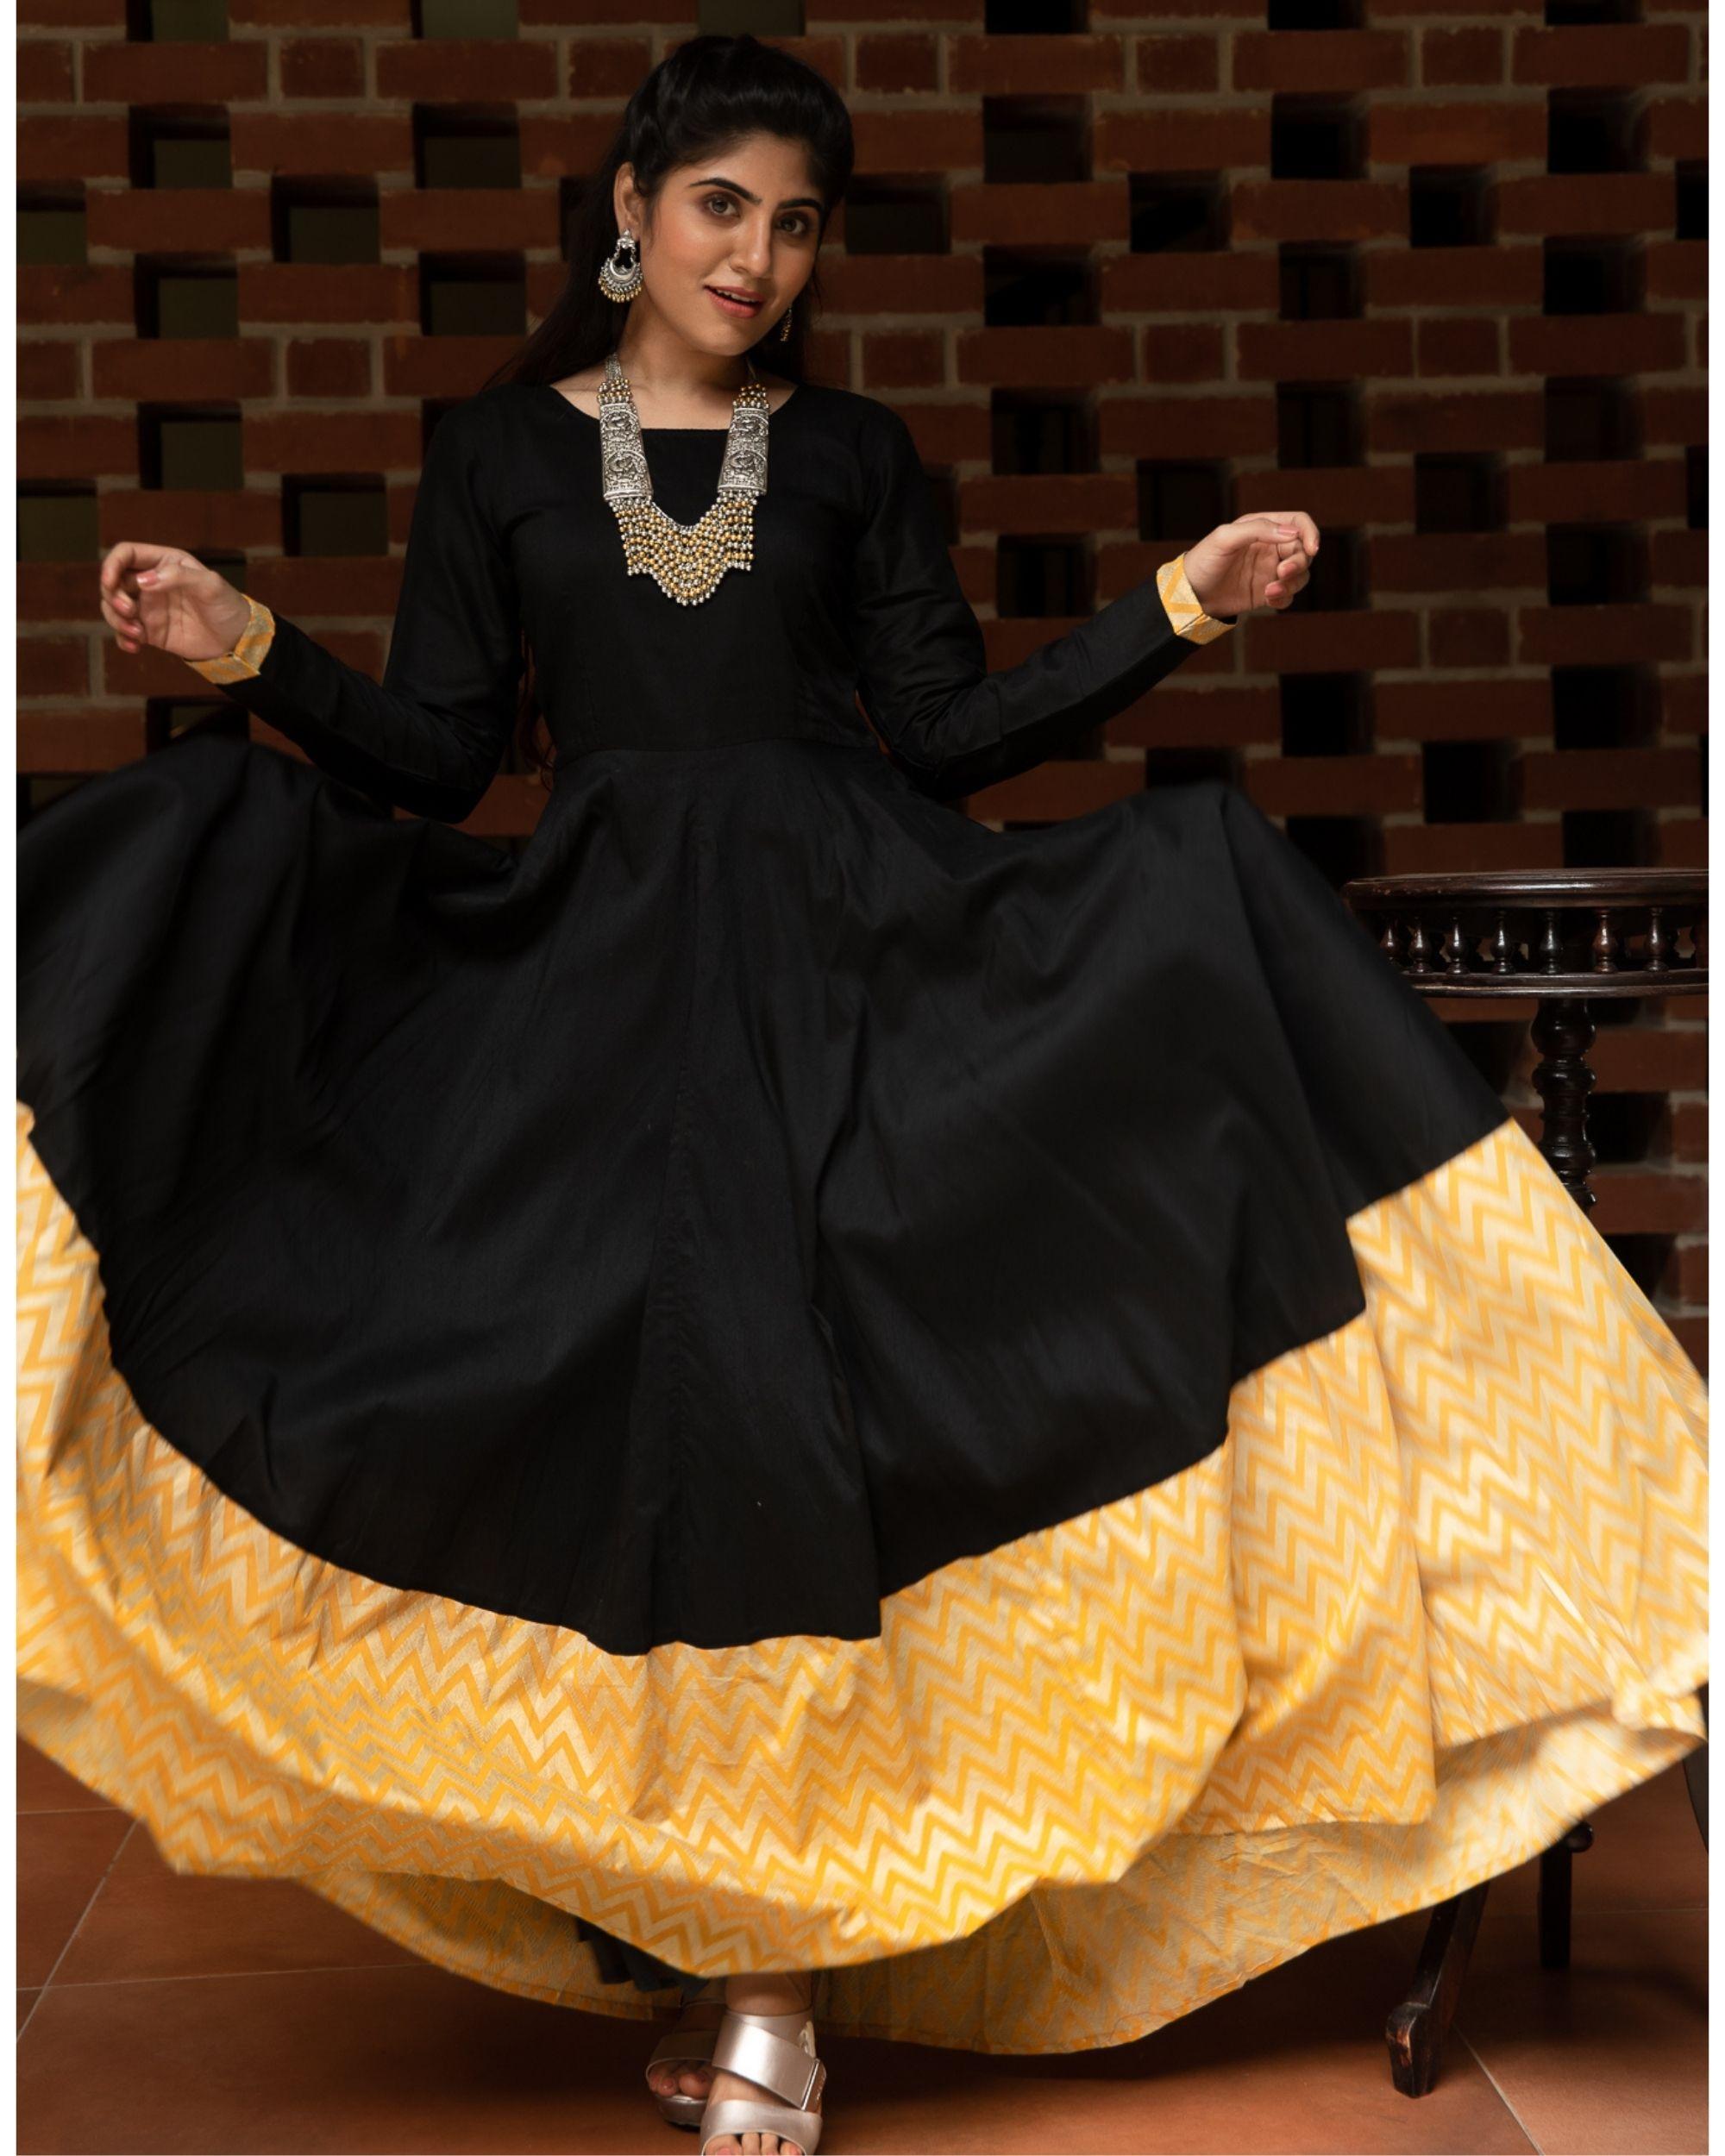 Black and yellow zig zag paneled dress